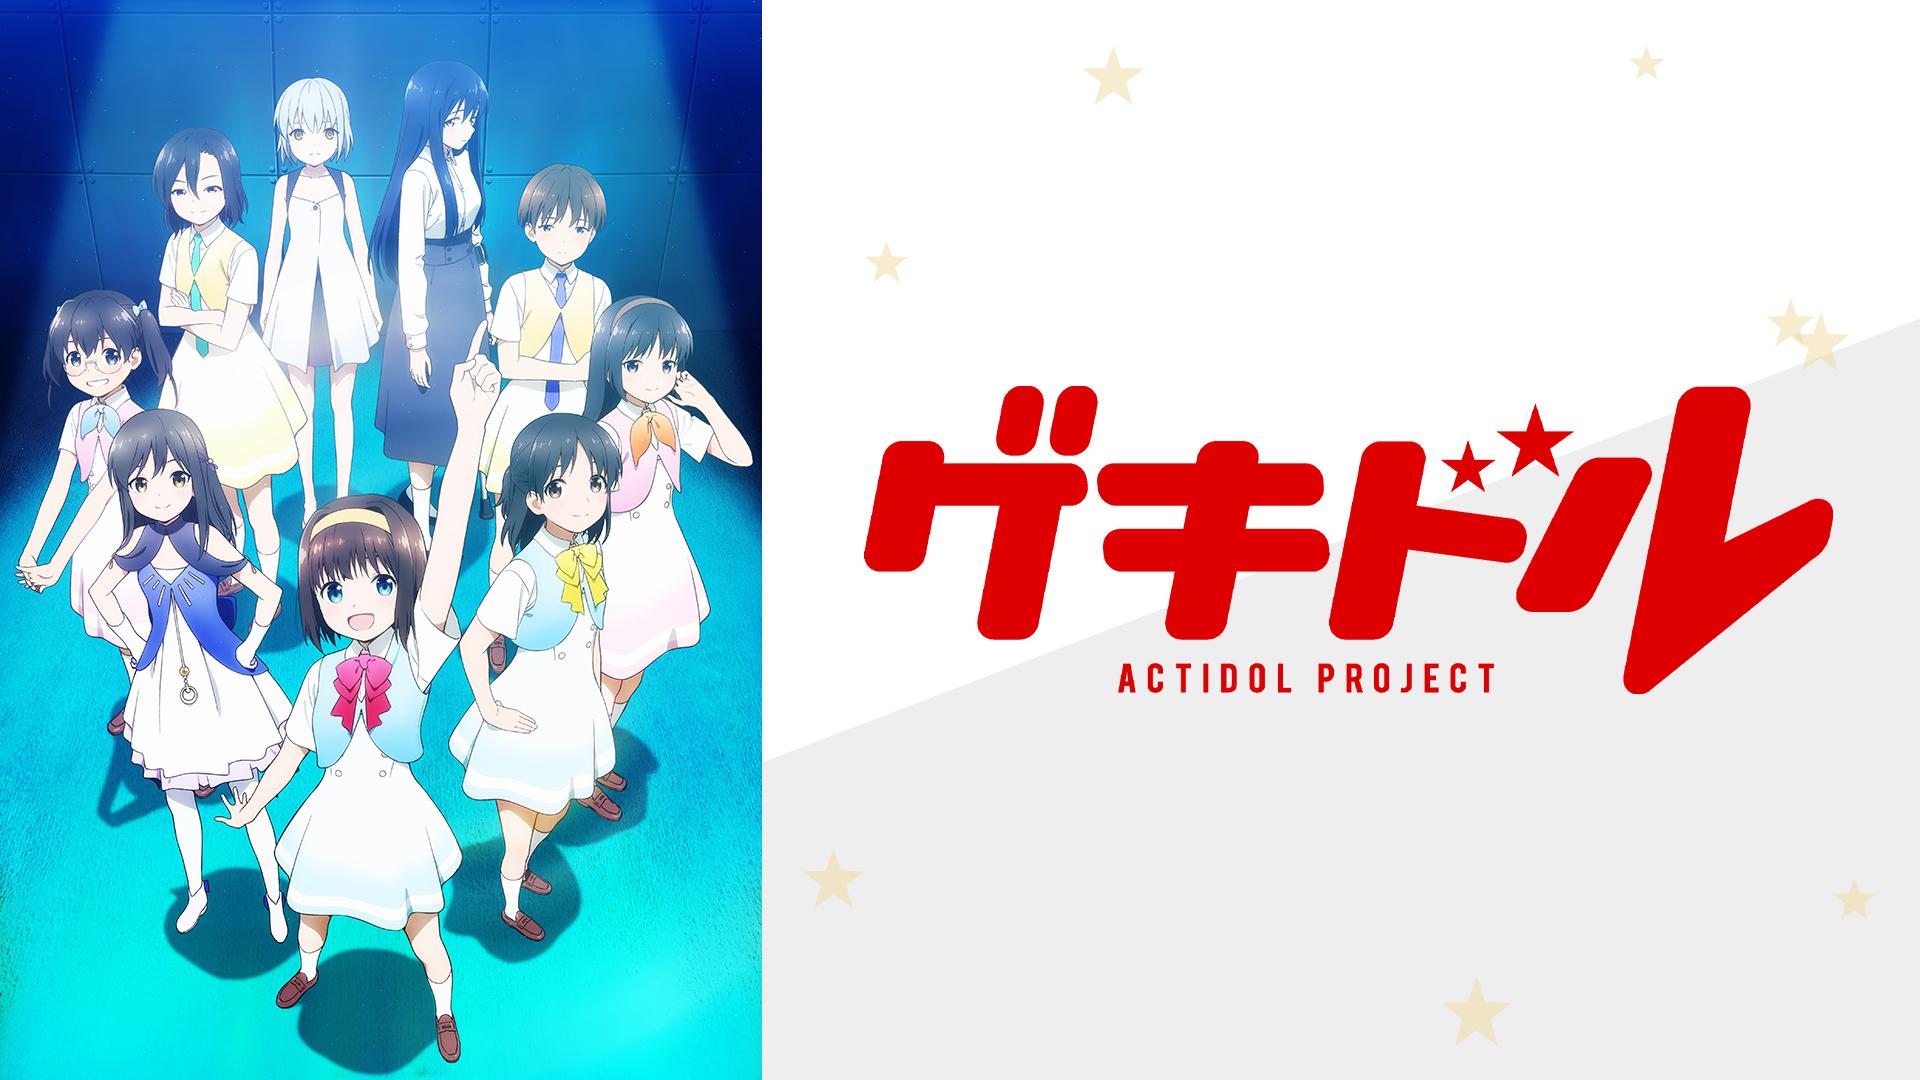 TVアニメ「ゲキドル」